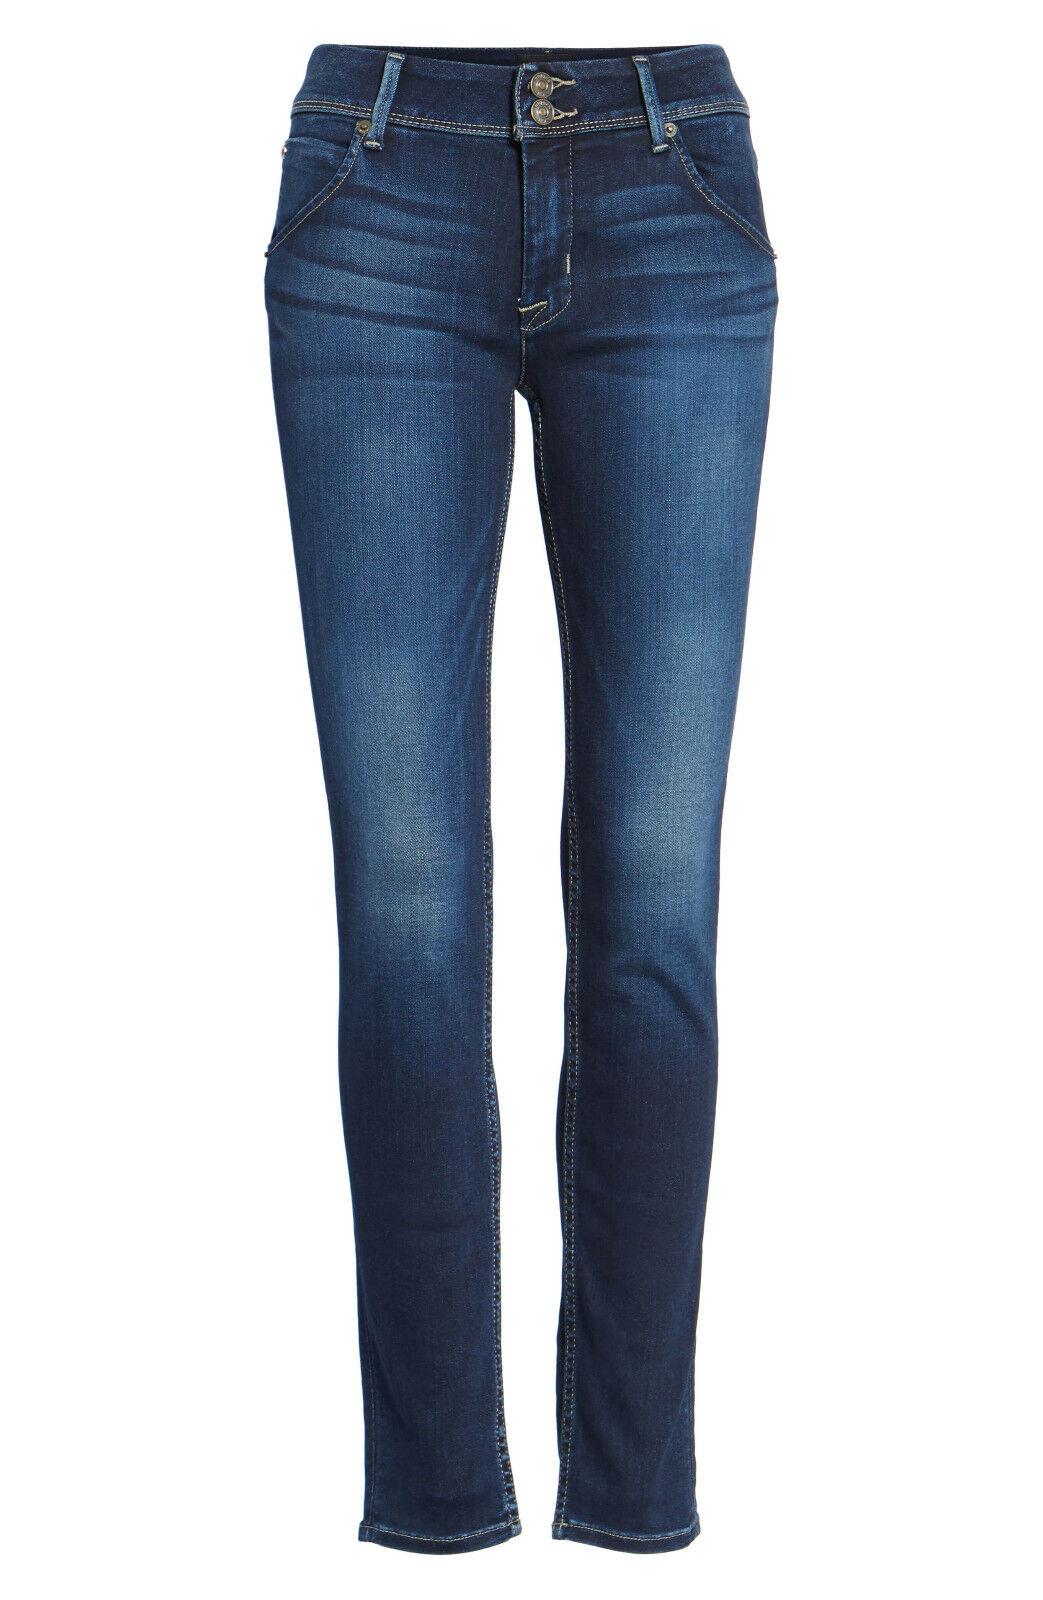 Hudson Jeans Collin Skinny Flap Dark Wash Slim Stretch Denim Pants Womens